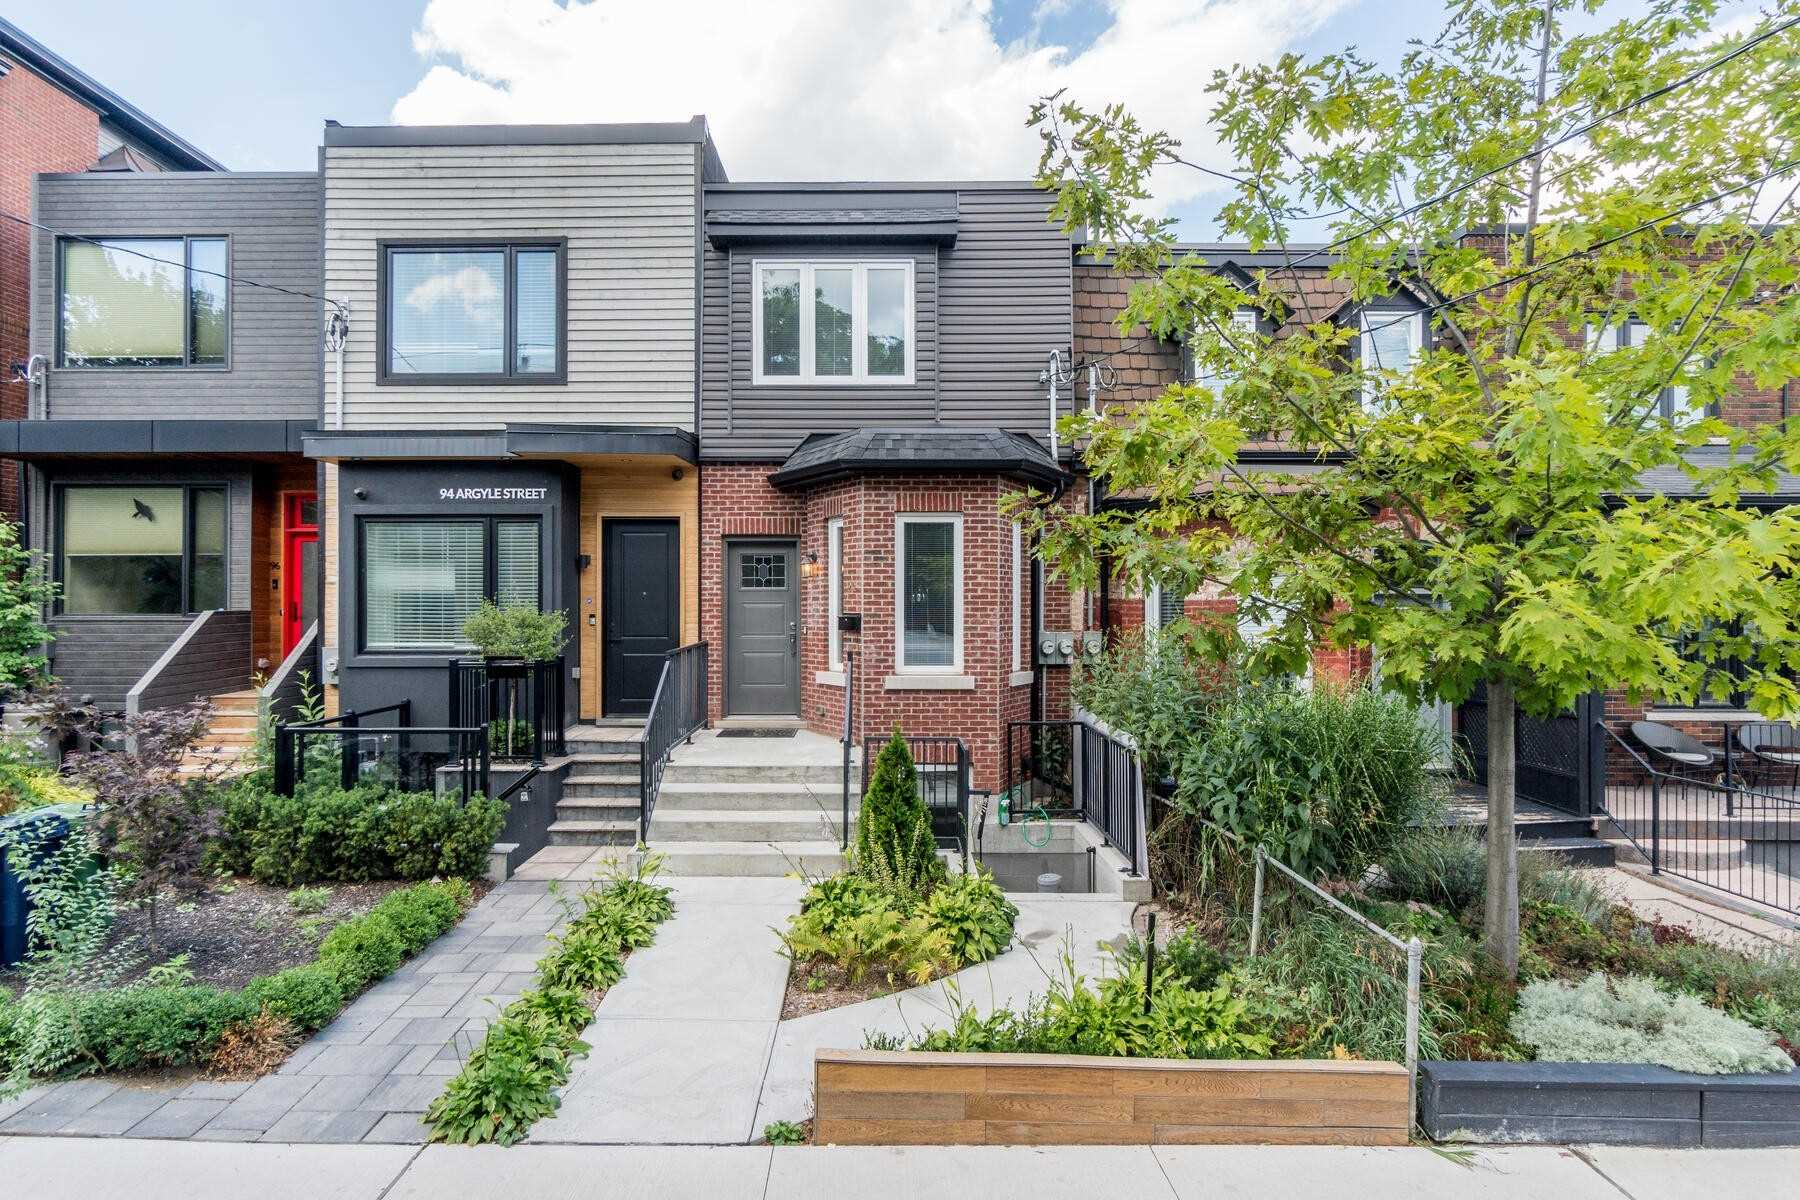 Att/row/twnhouse For Sale In Toronto , 3 Bedrooms Bedrooms, ,3 BathroomsBathrooms,Att/row/twnhouse,For Sale,Argyle